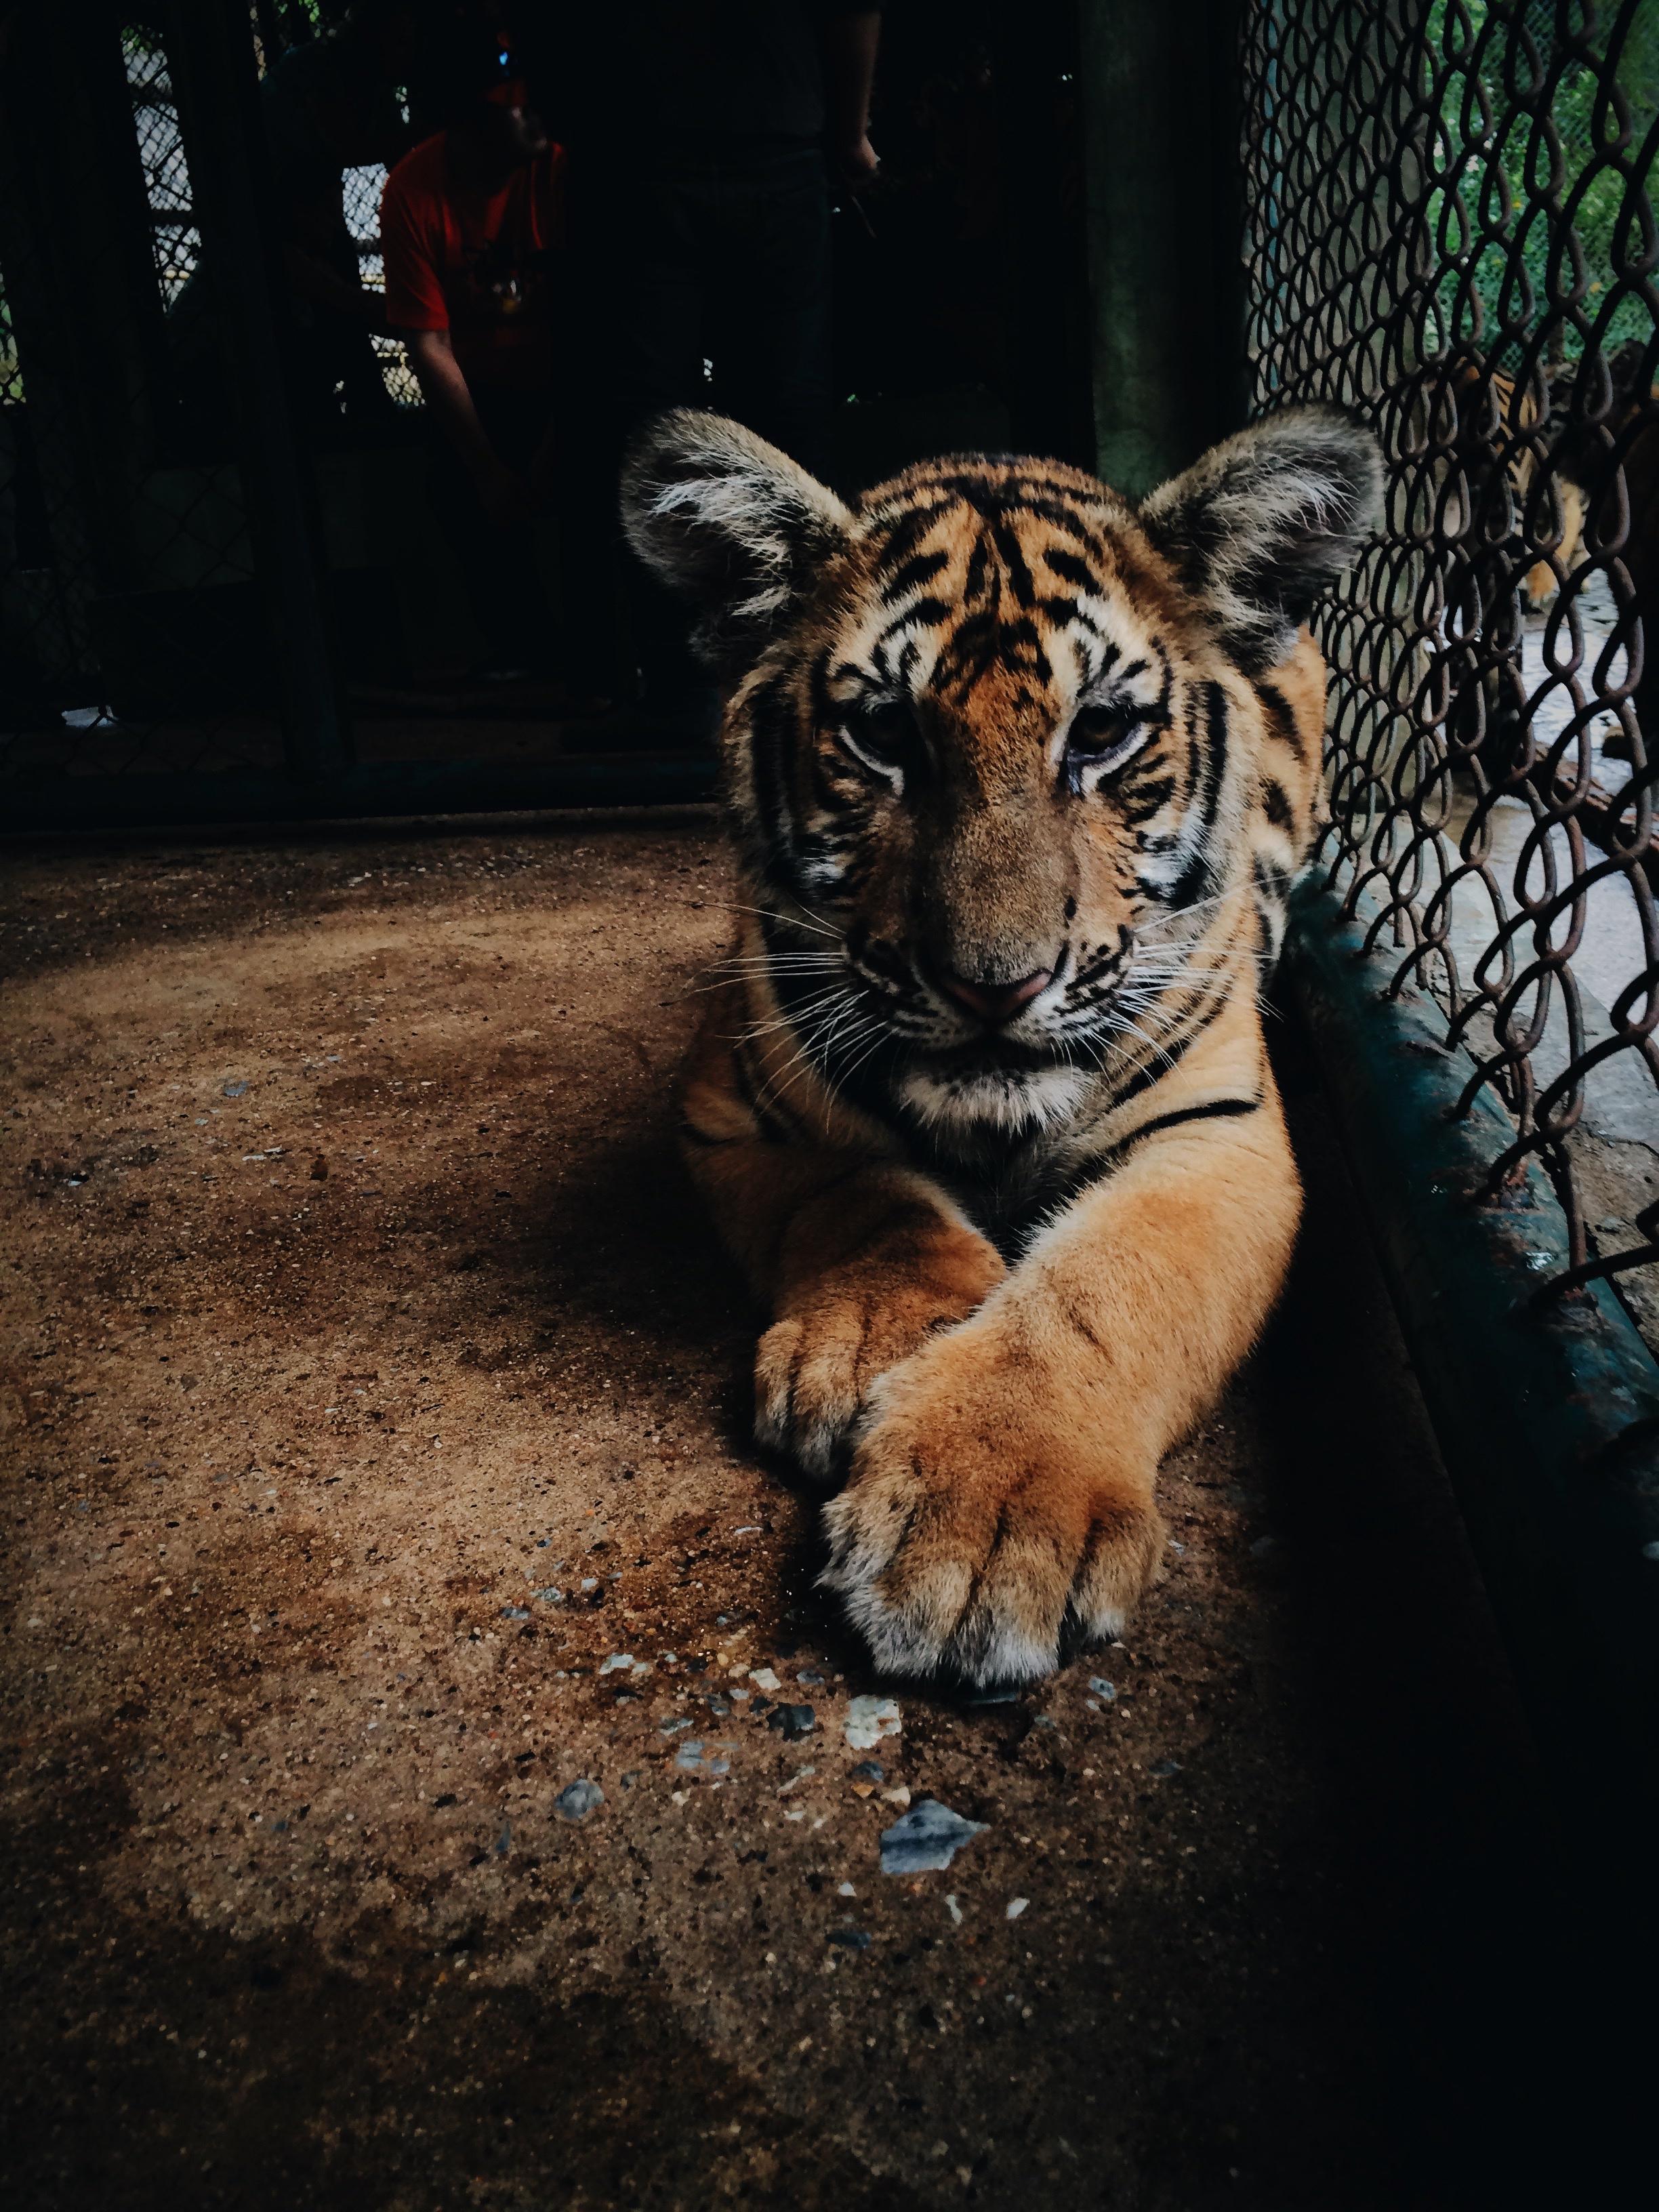 TIGER Photo by Paula Borowska